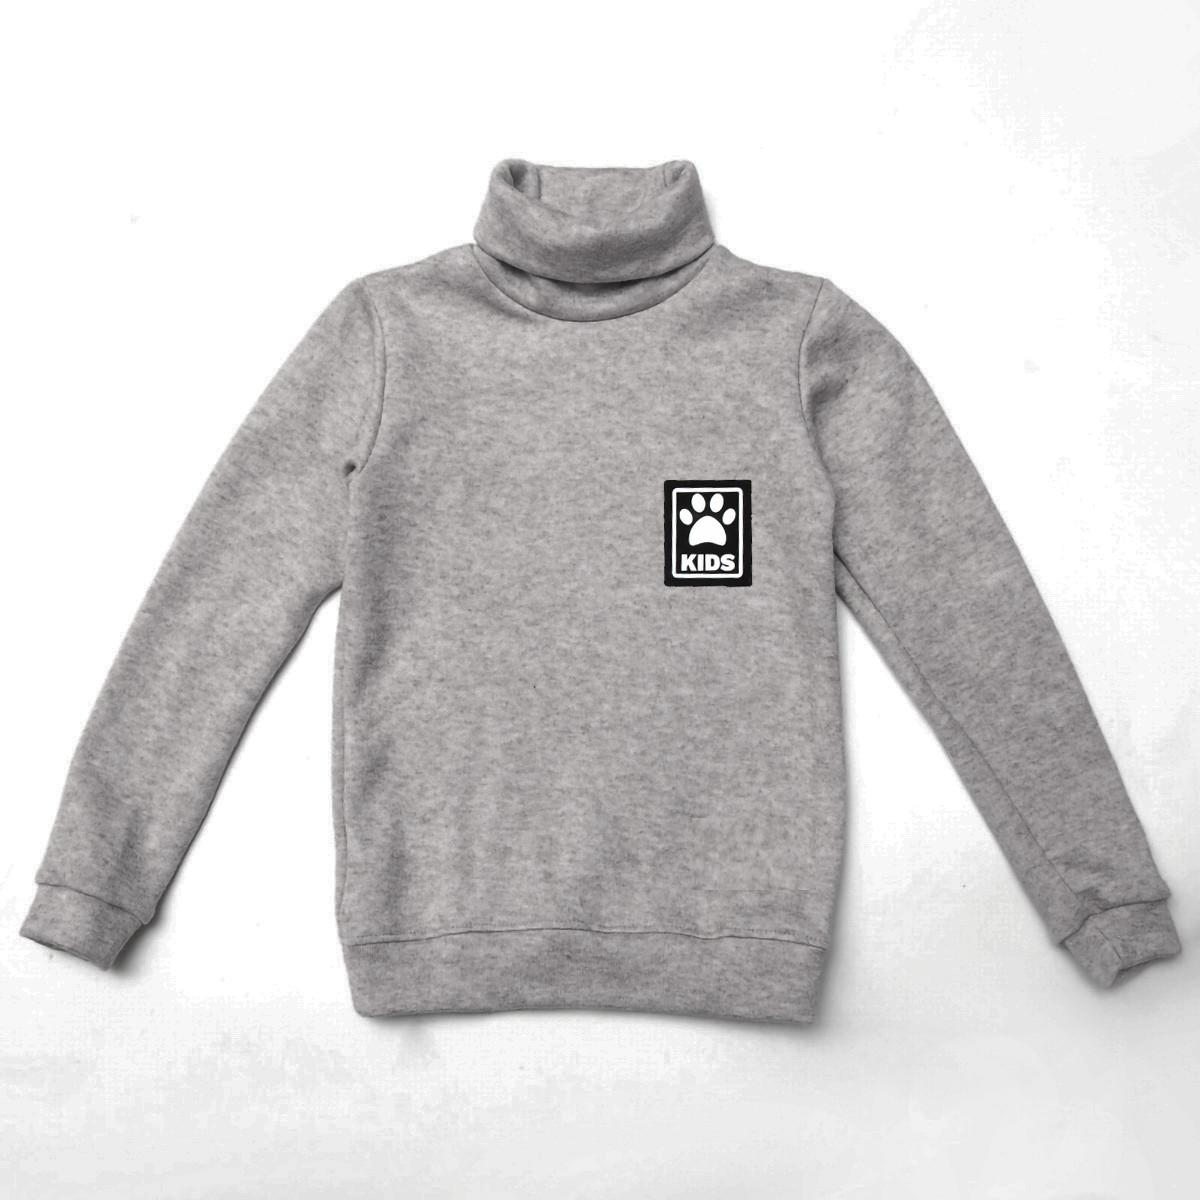 Теплый детский свитер р.104,110,116,122 SmileTime Lapki Kids, серый